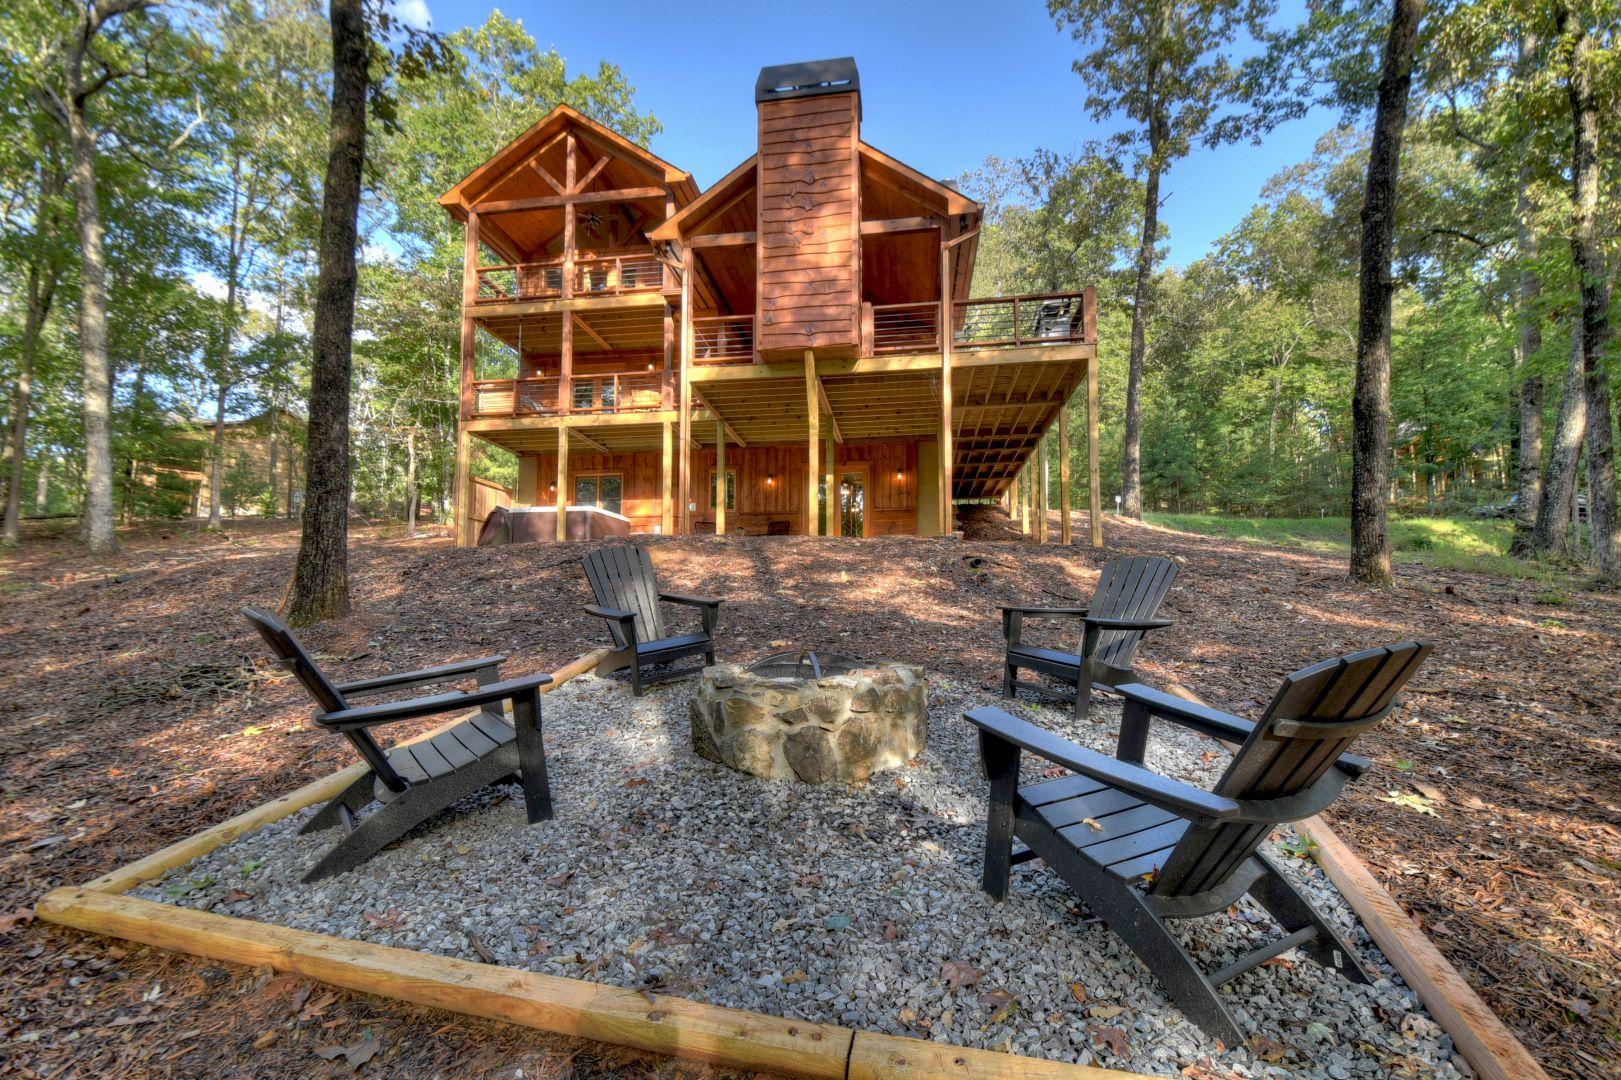 Rusty Nail Rental Cabin